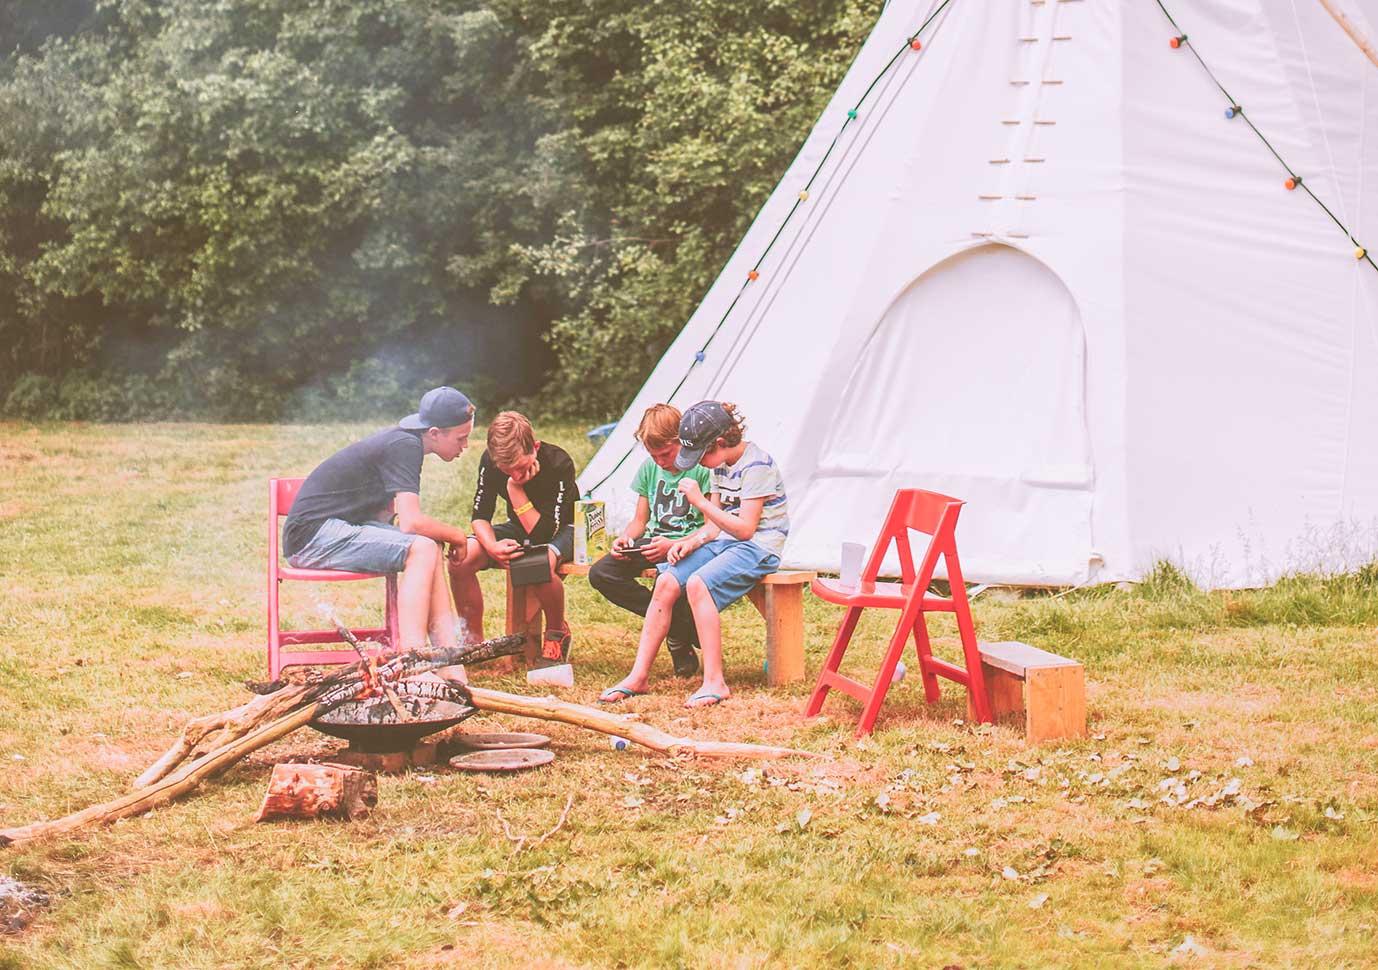 6x Inspirerende Boomhutten : Kleineglobetrotter.nl 5 x smaakvolle kindvriendelijke campings in